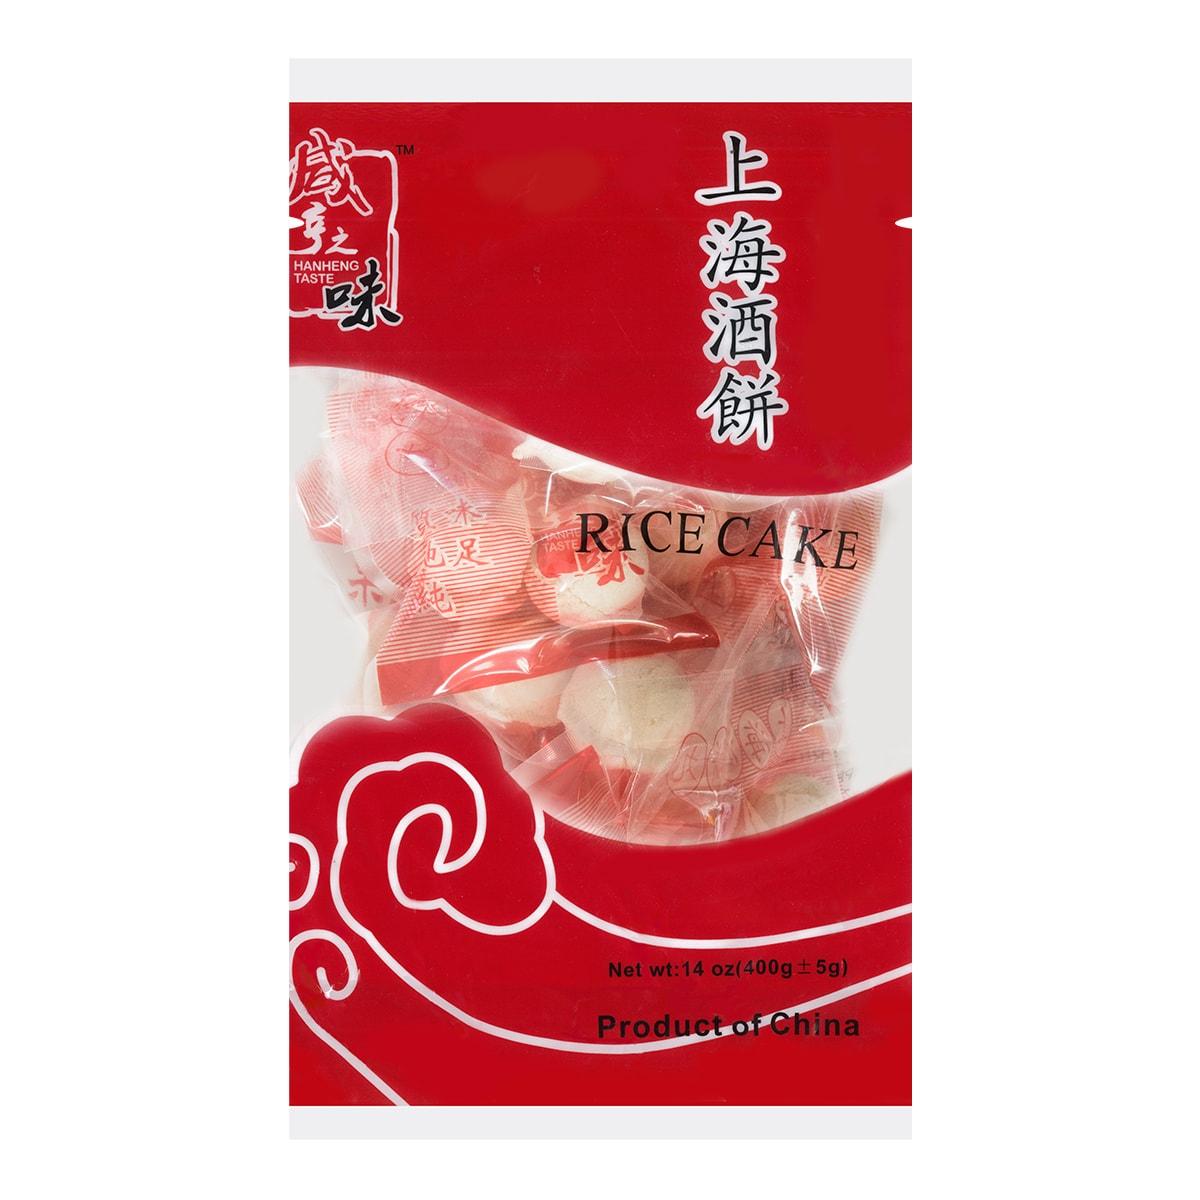 HANHENG TASTE Rice Cake 400g